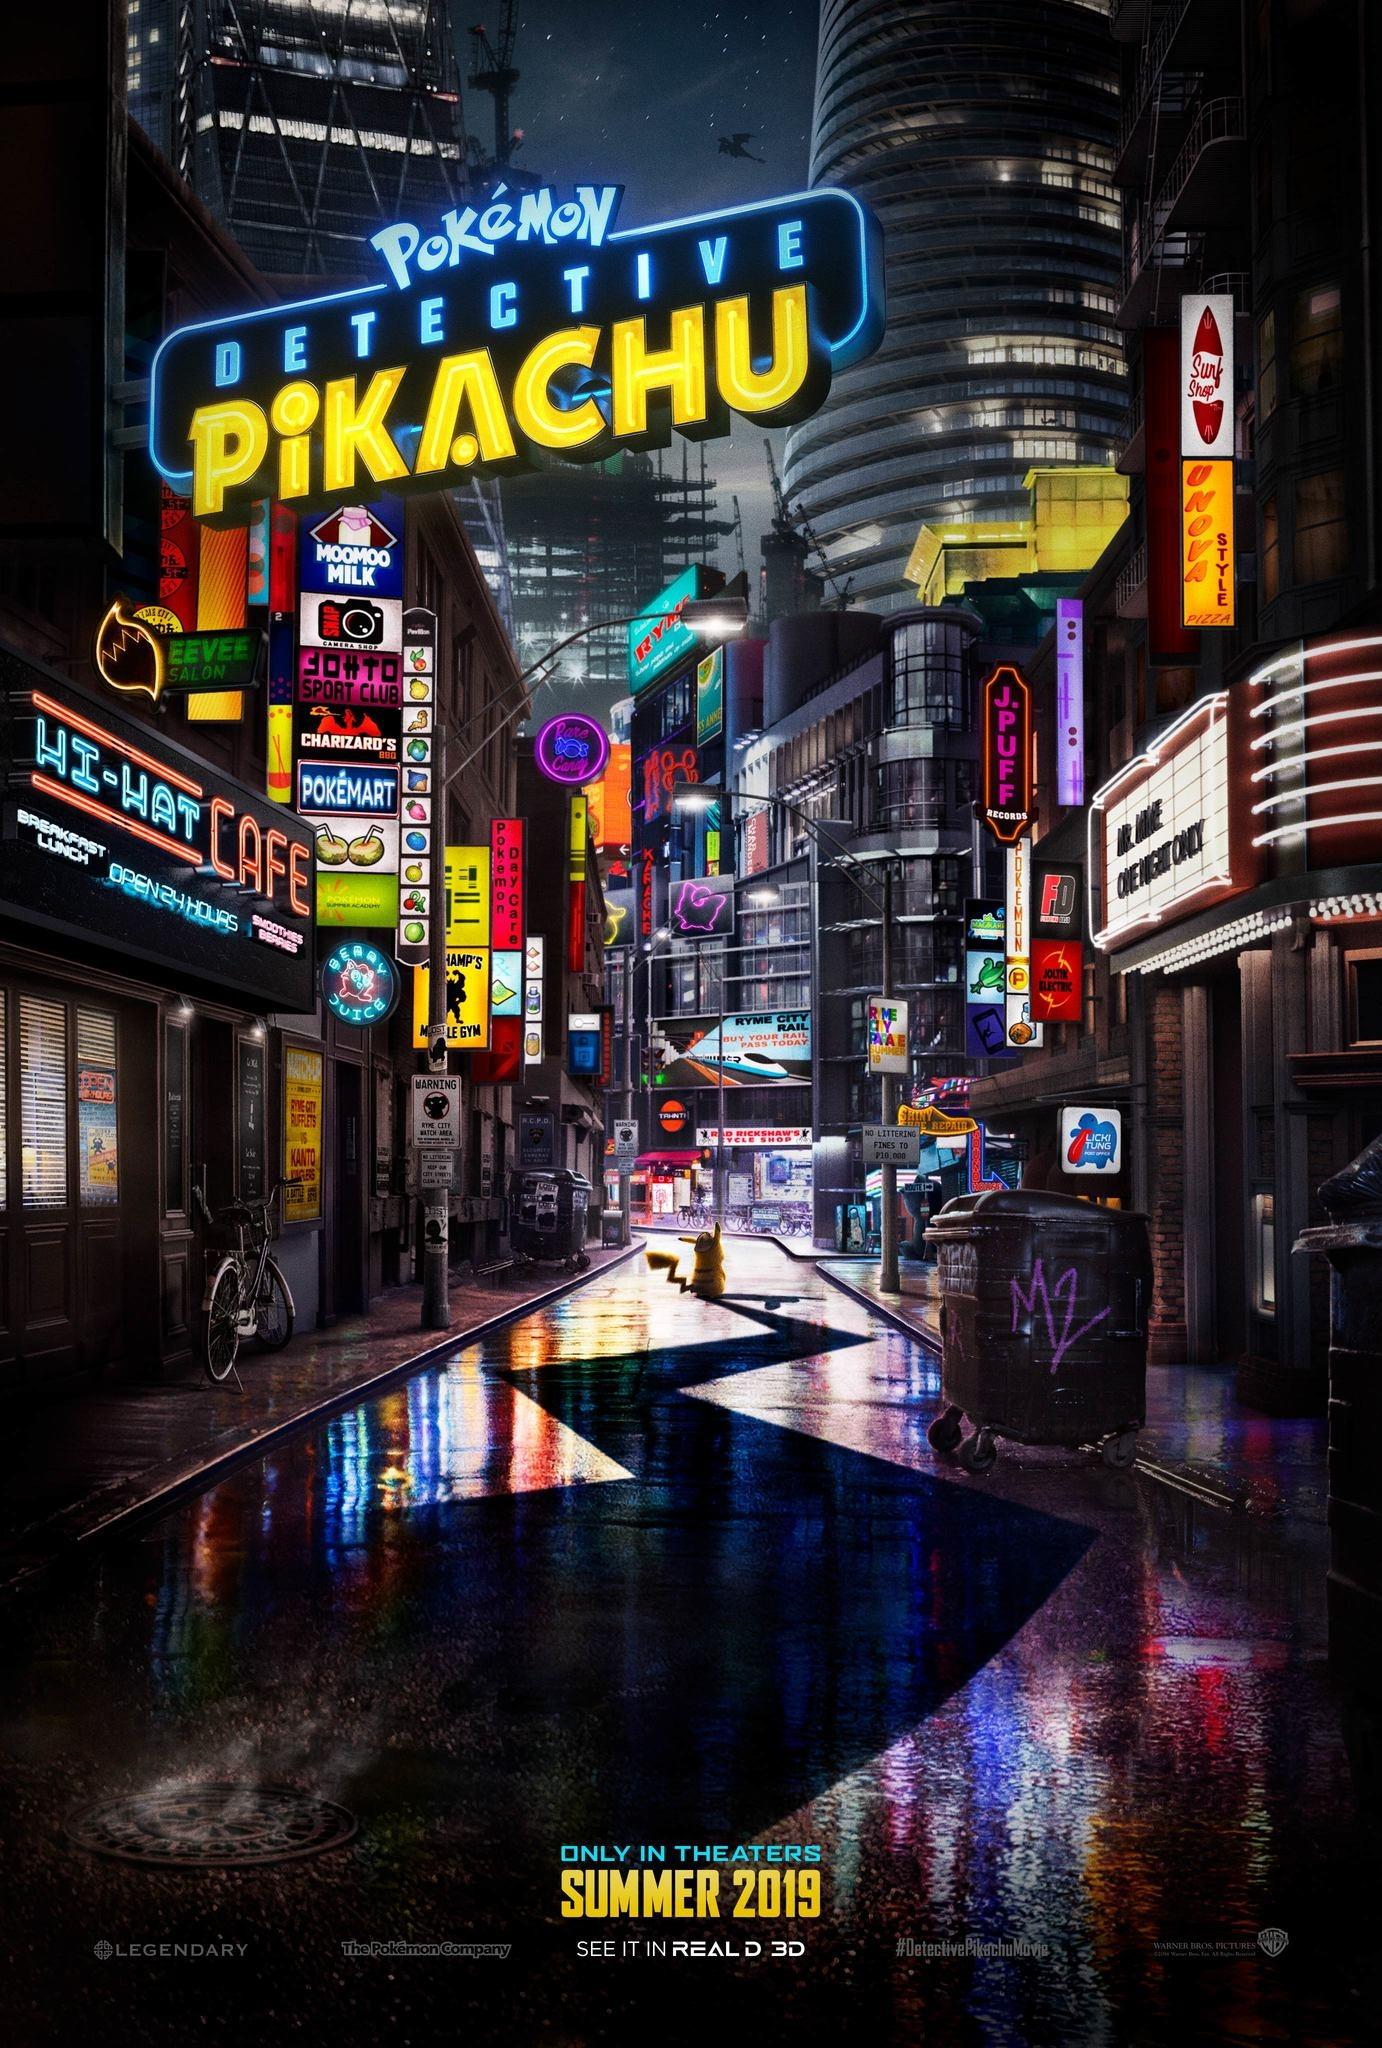 szmk_detective_pikachu_pokemon.jpg